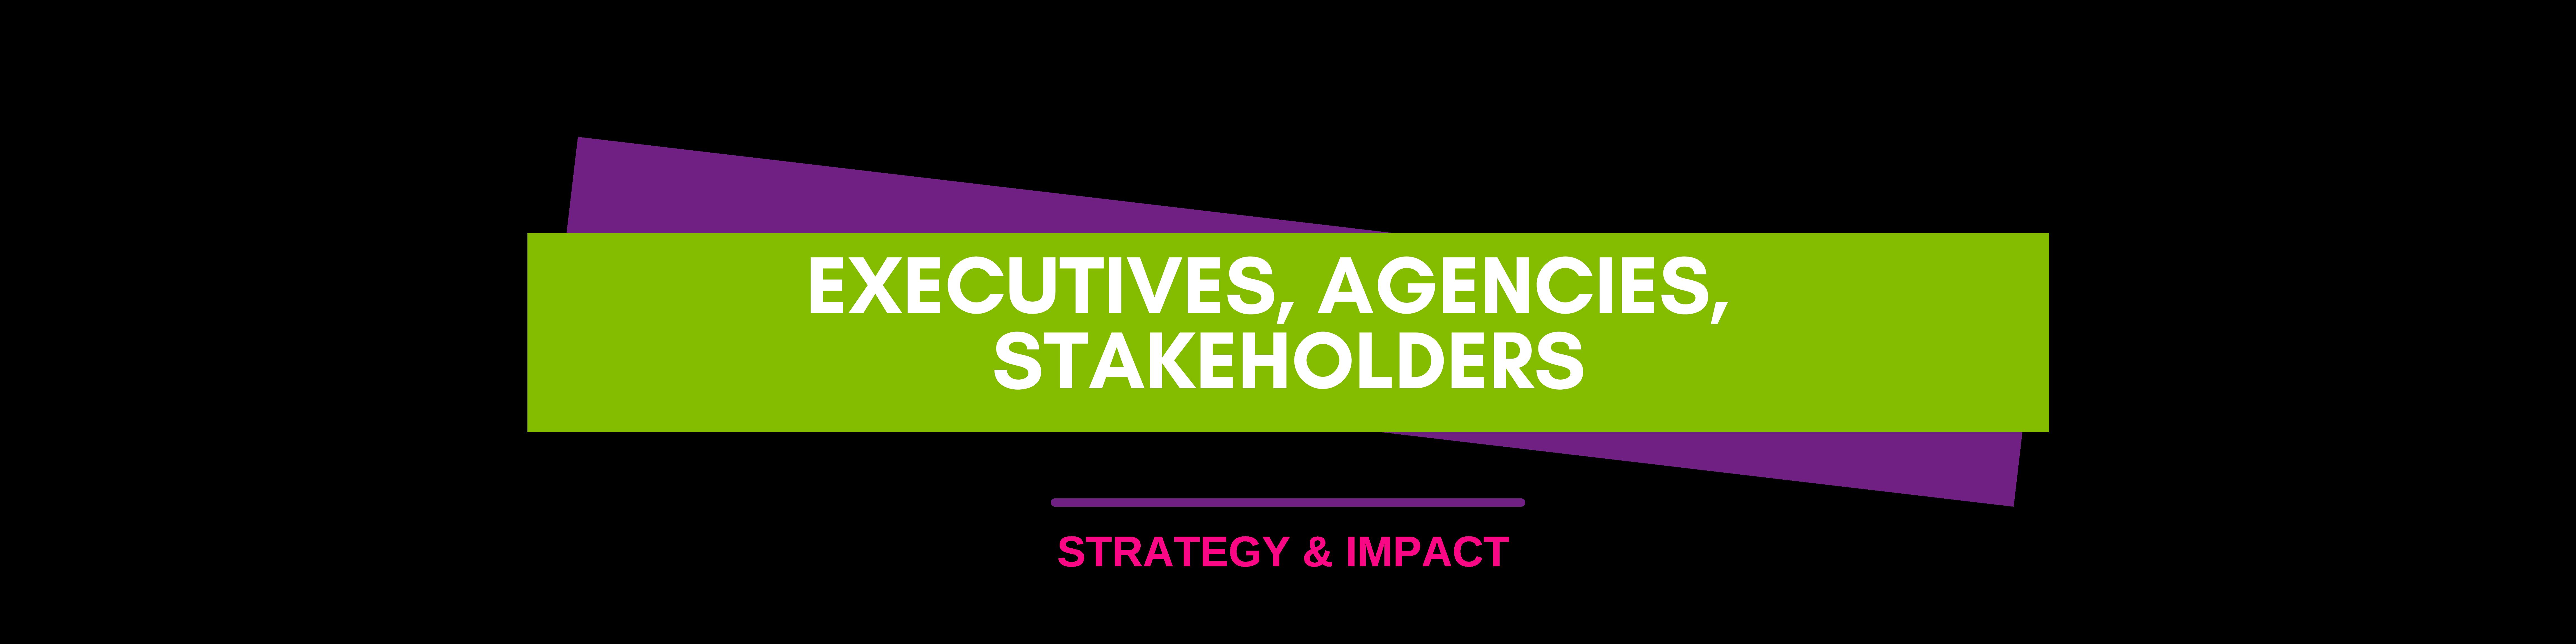 Dream-Team-Executive-Title-Banner-Assuaged